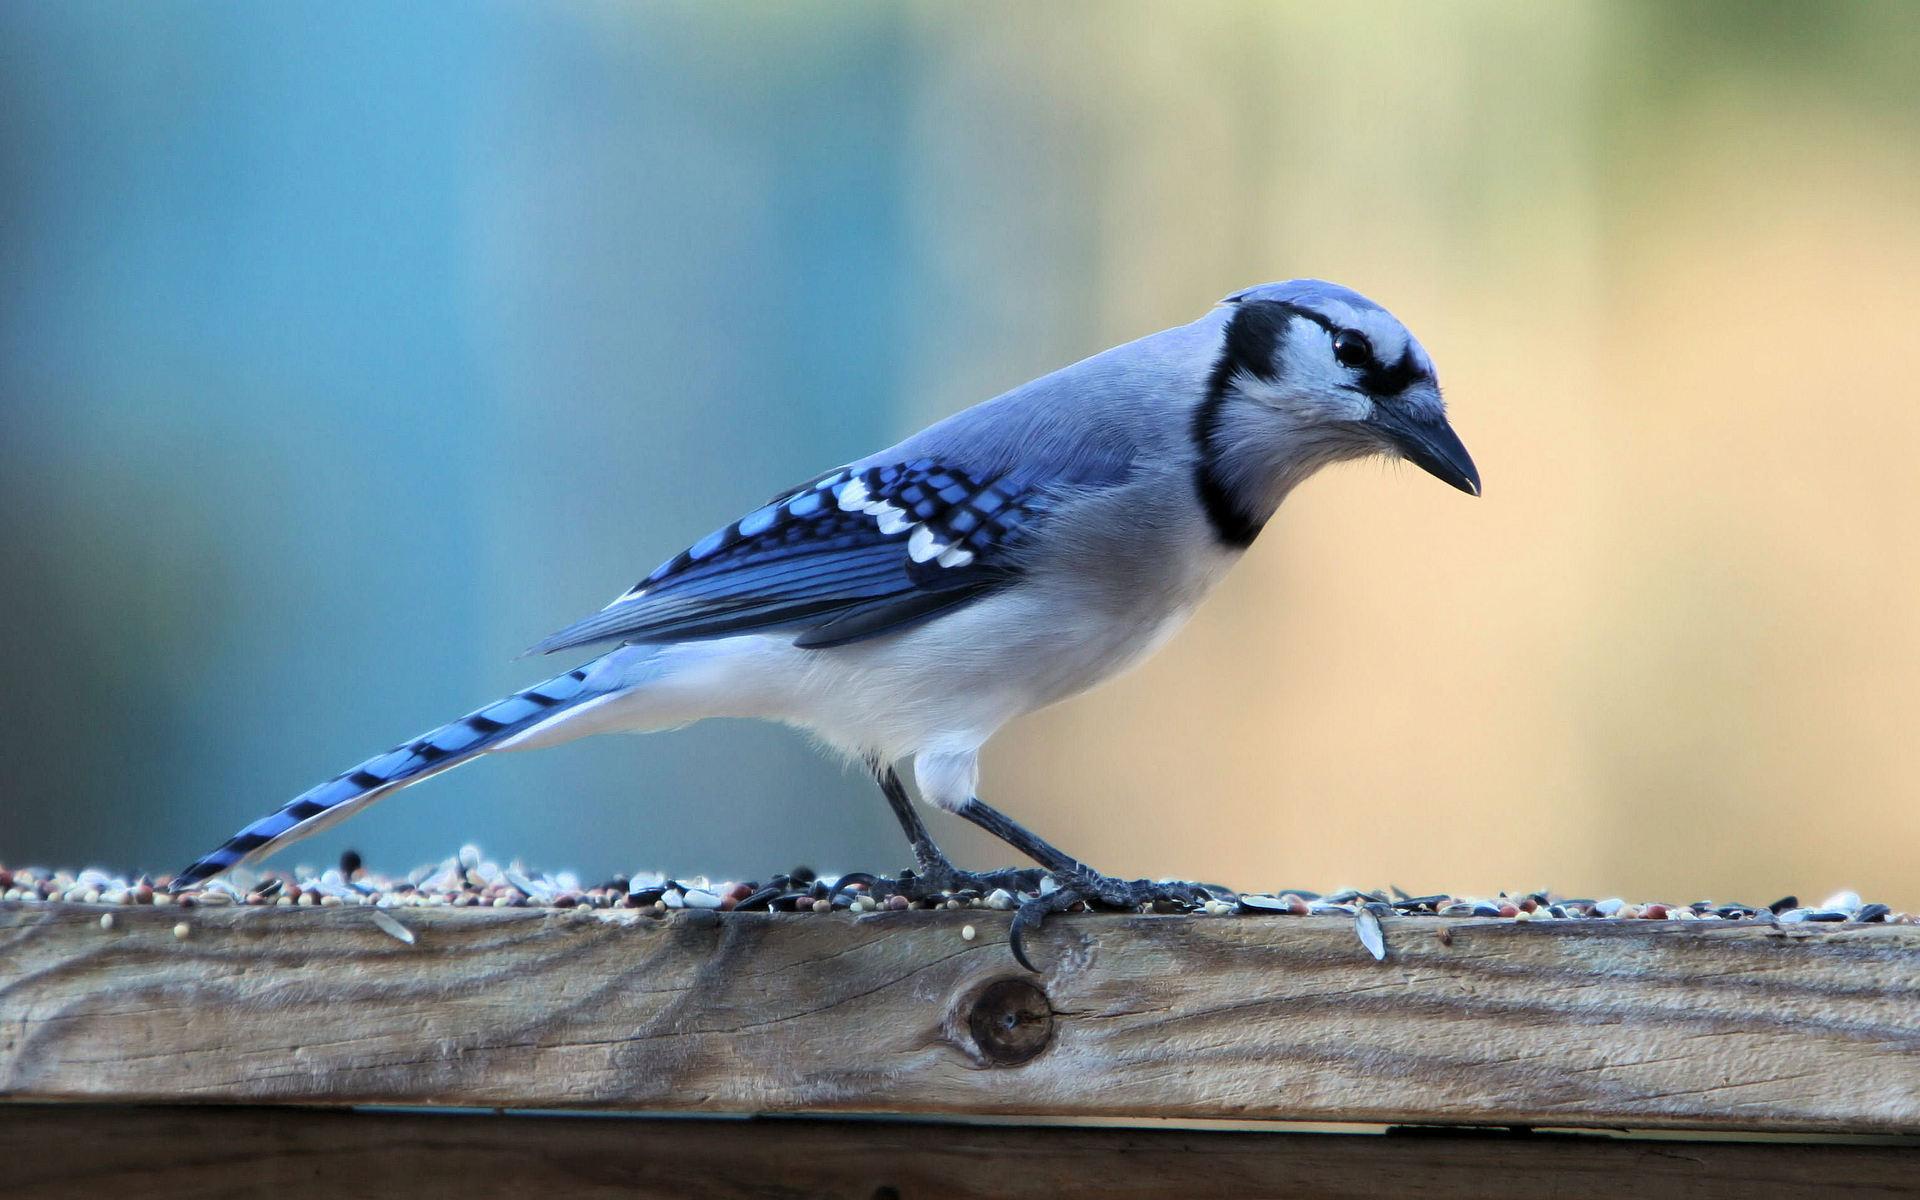 Beautiful Blue Bird Wallpaper HD Wallpapers 1920x1200